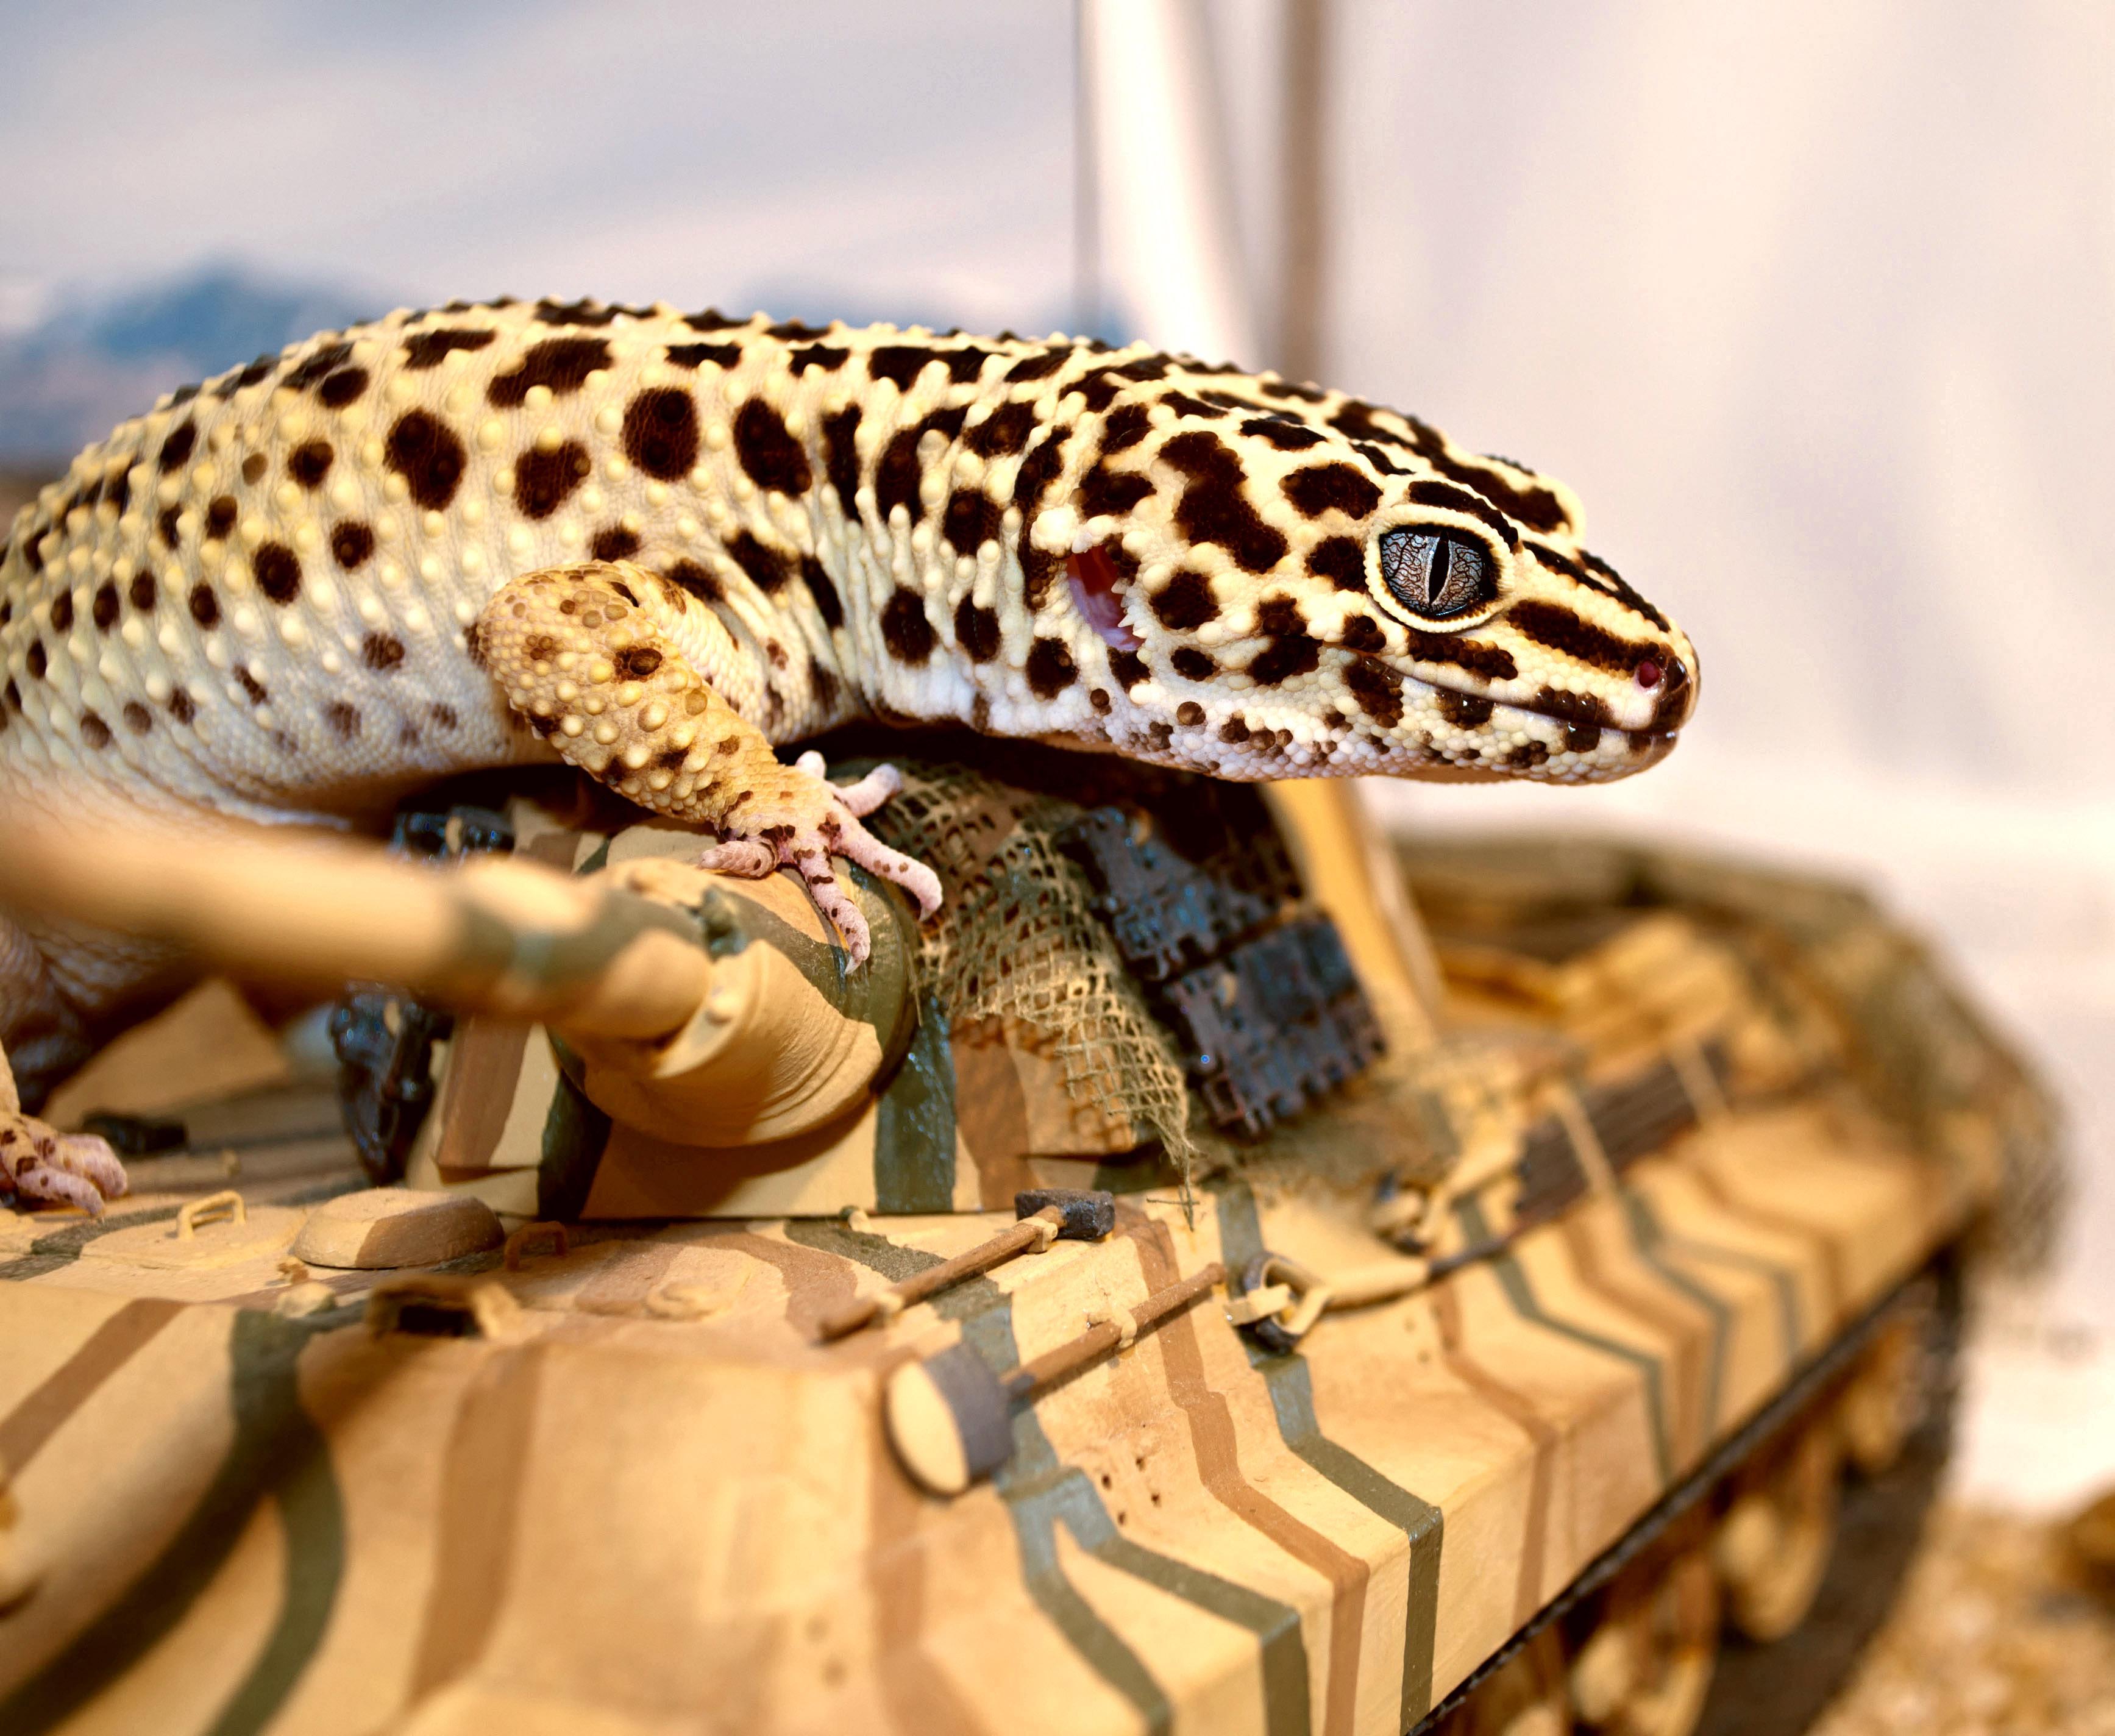 Картинка: Геккон, ящерица, пятна, танк